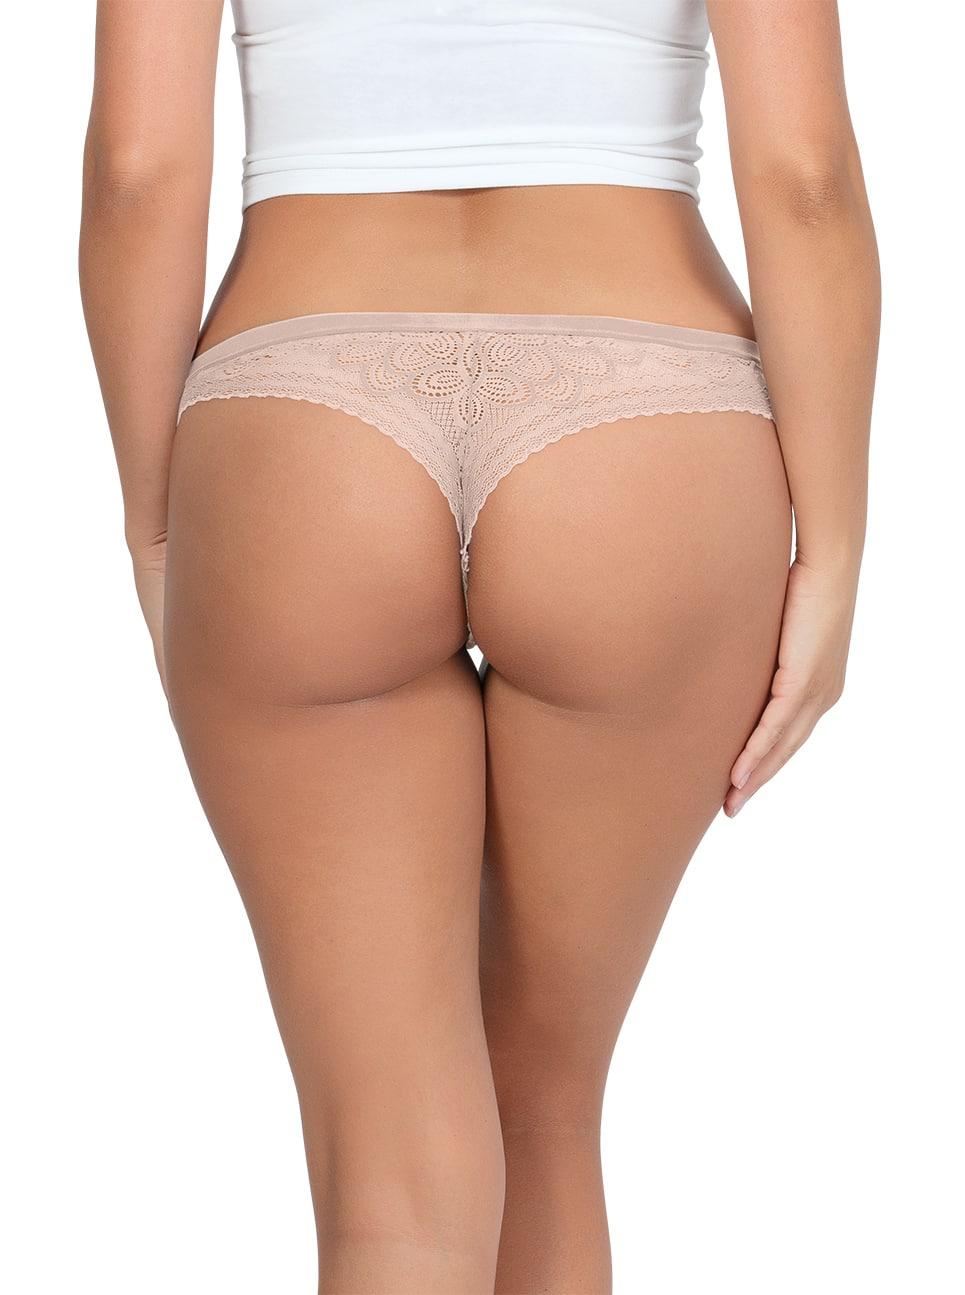 PARFAIT ParfaitPanty SoGlam ThongPP402 Bare Back - Parfait Panty So Glam Thong - Bare - PP402